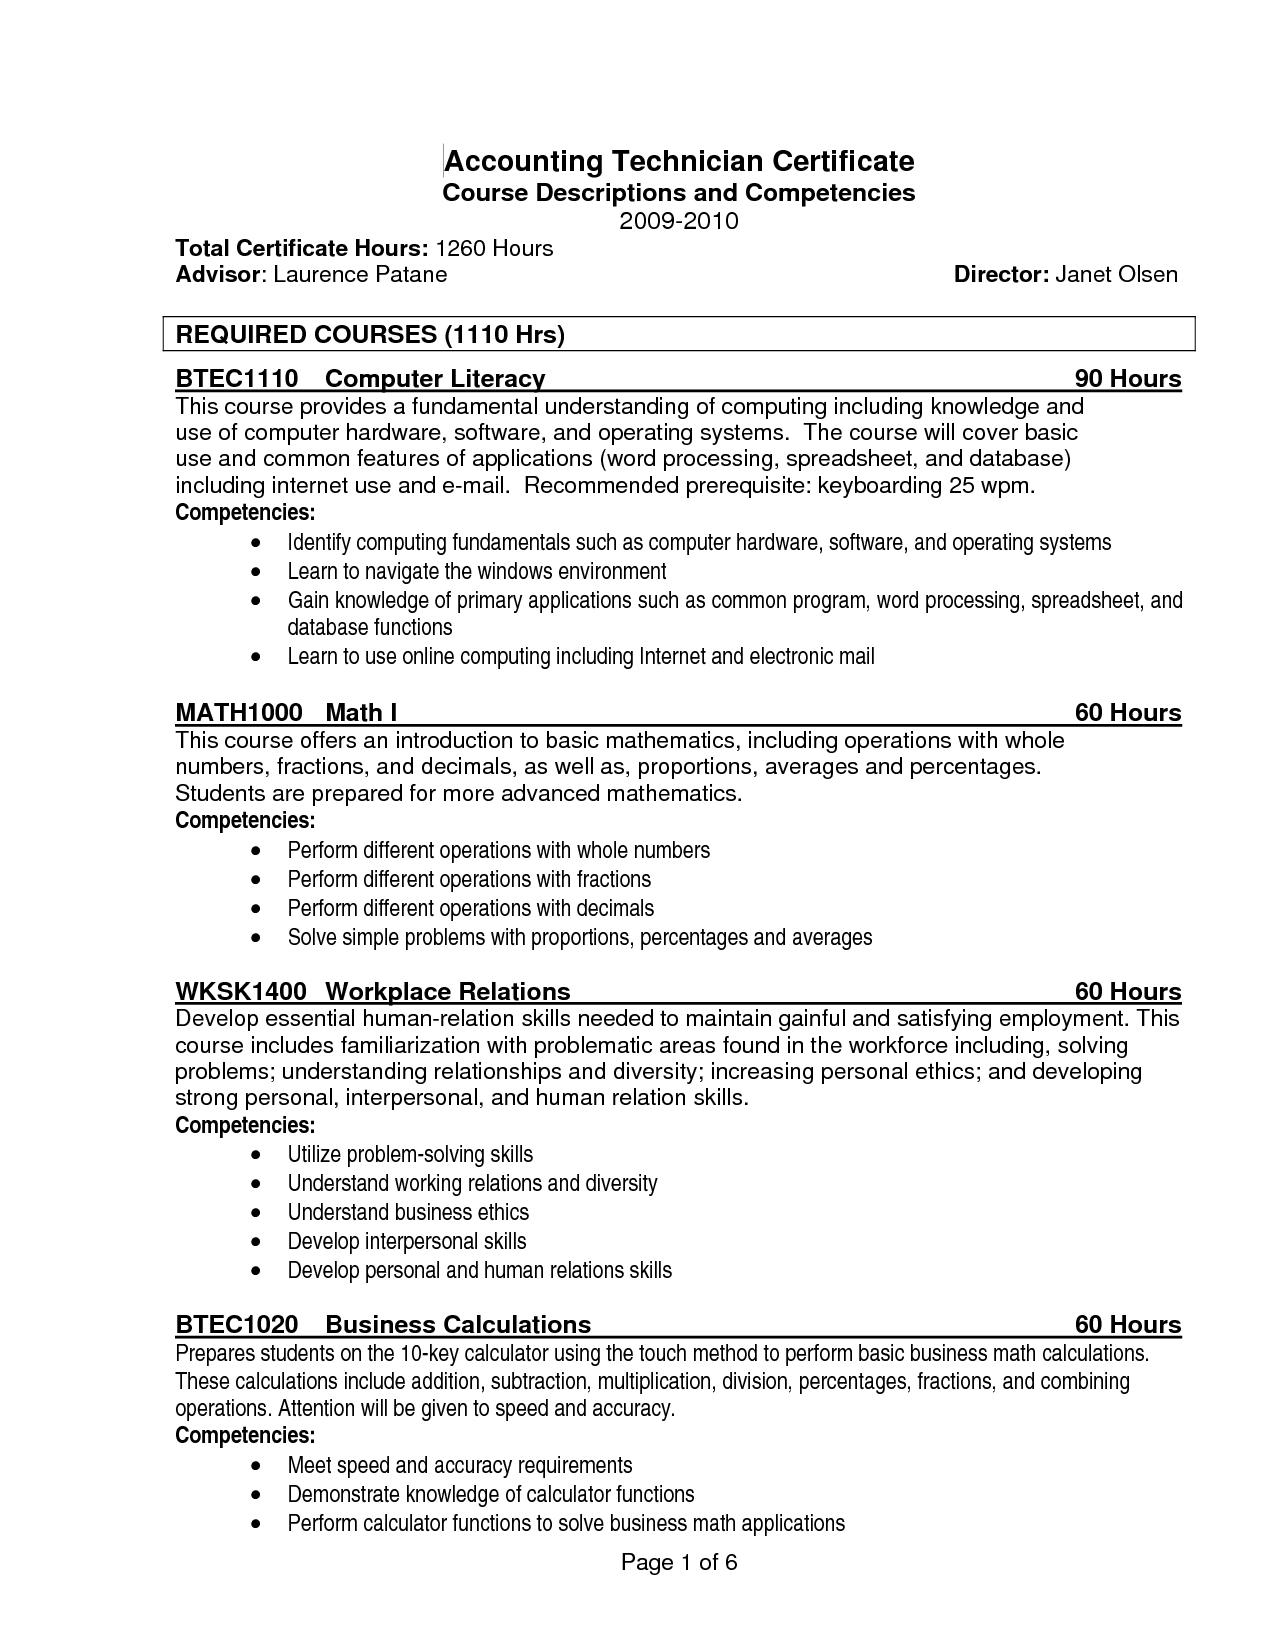 resume templates qualifications